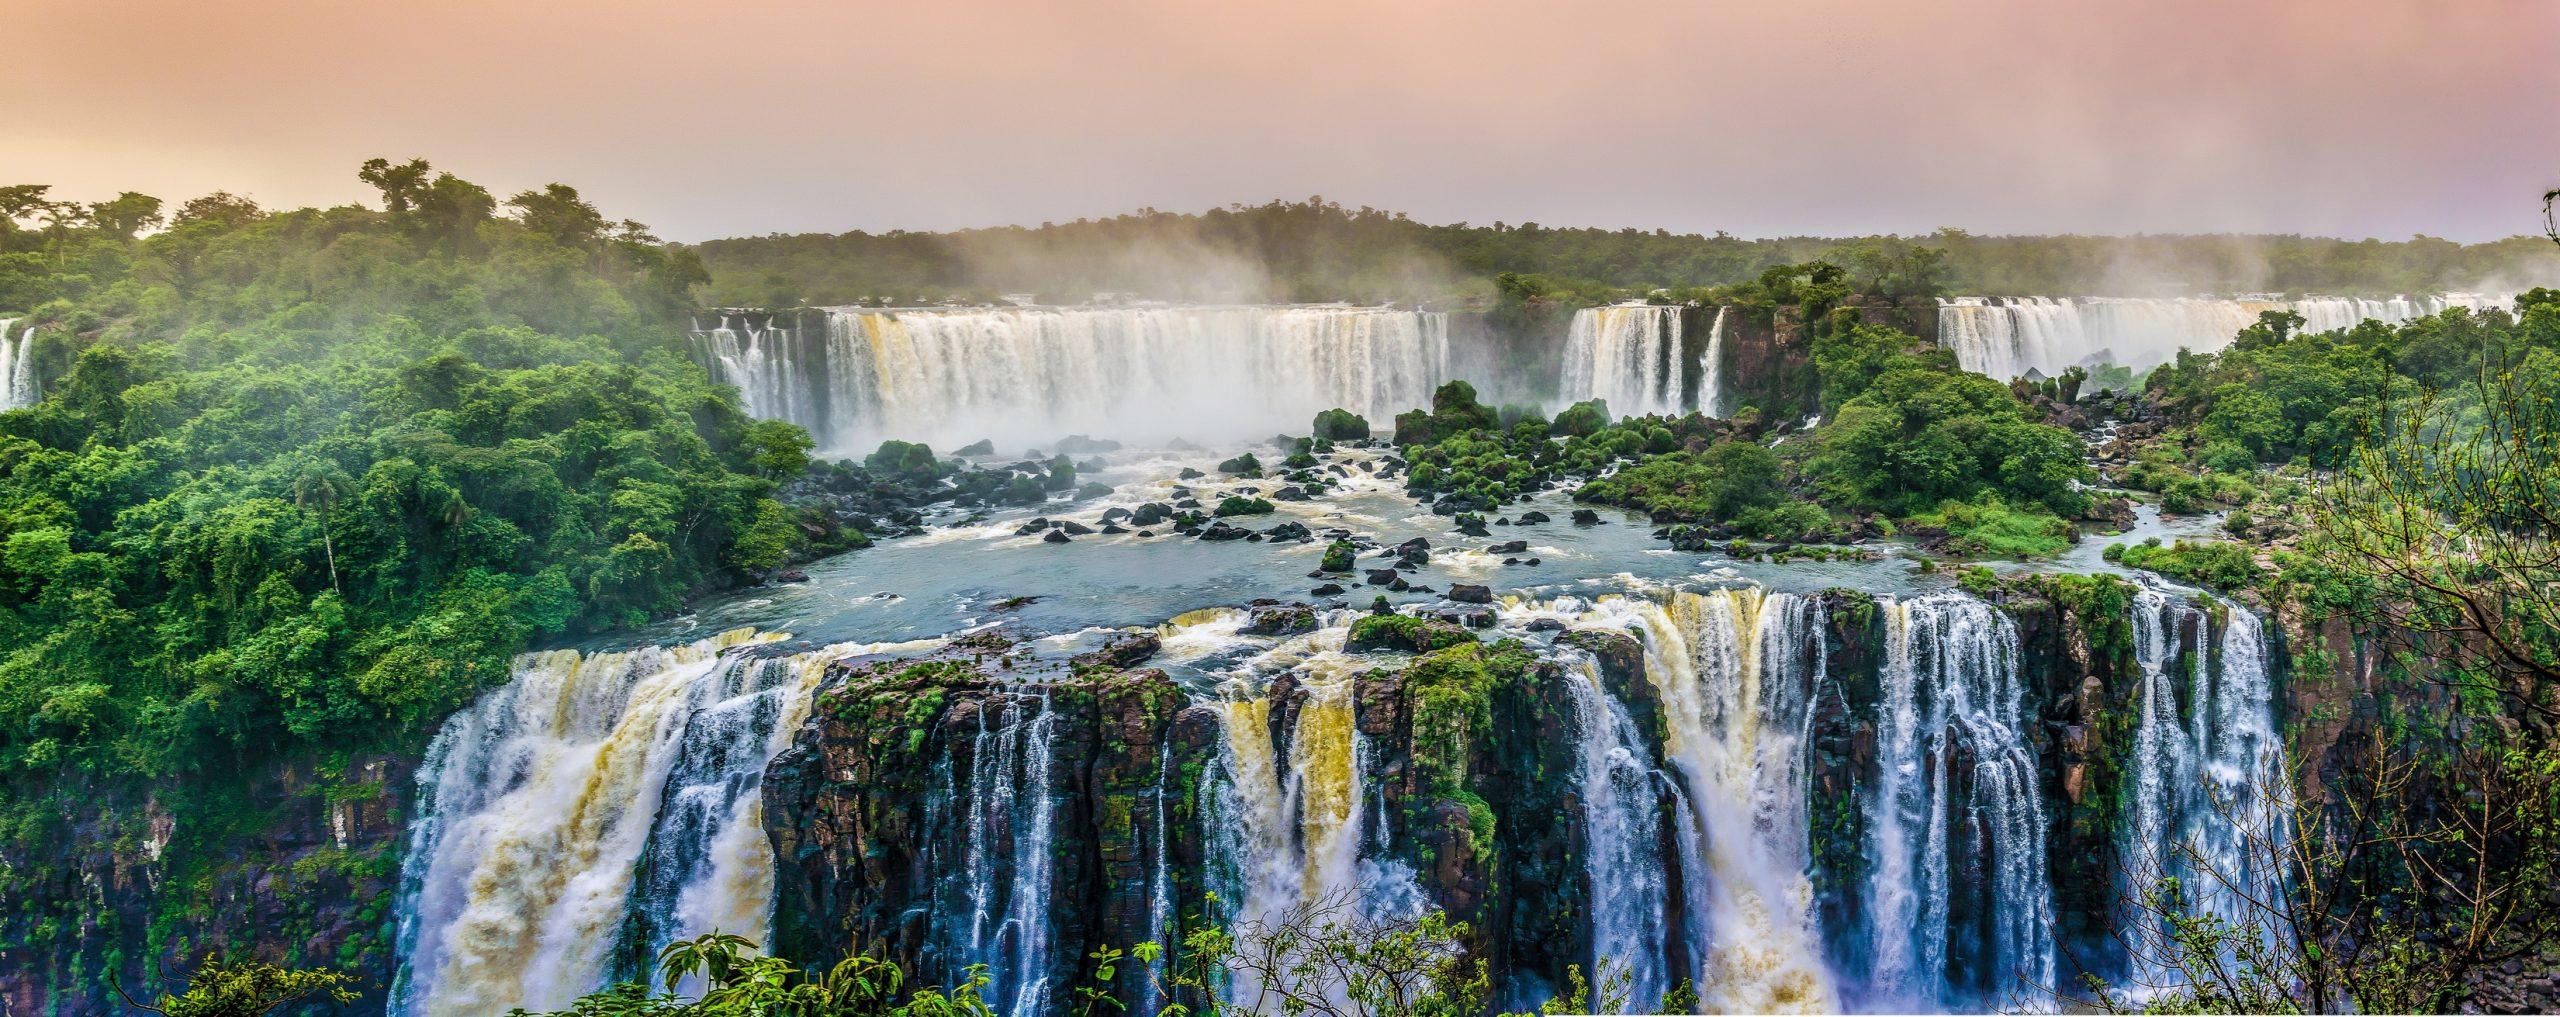 MuellMuseum_Soldiner_Kiez_waterfall